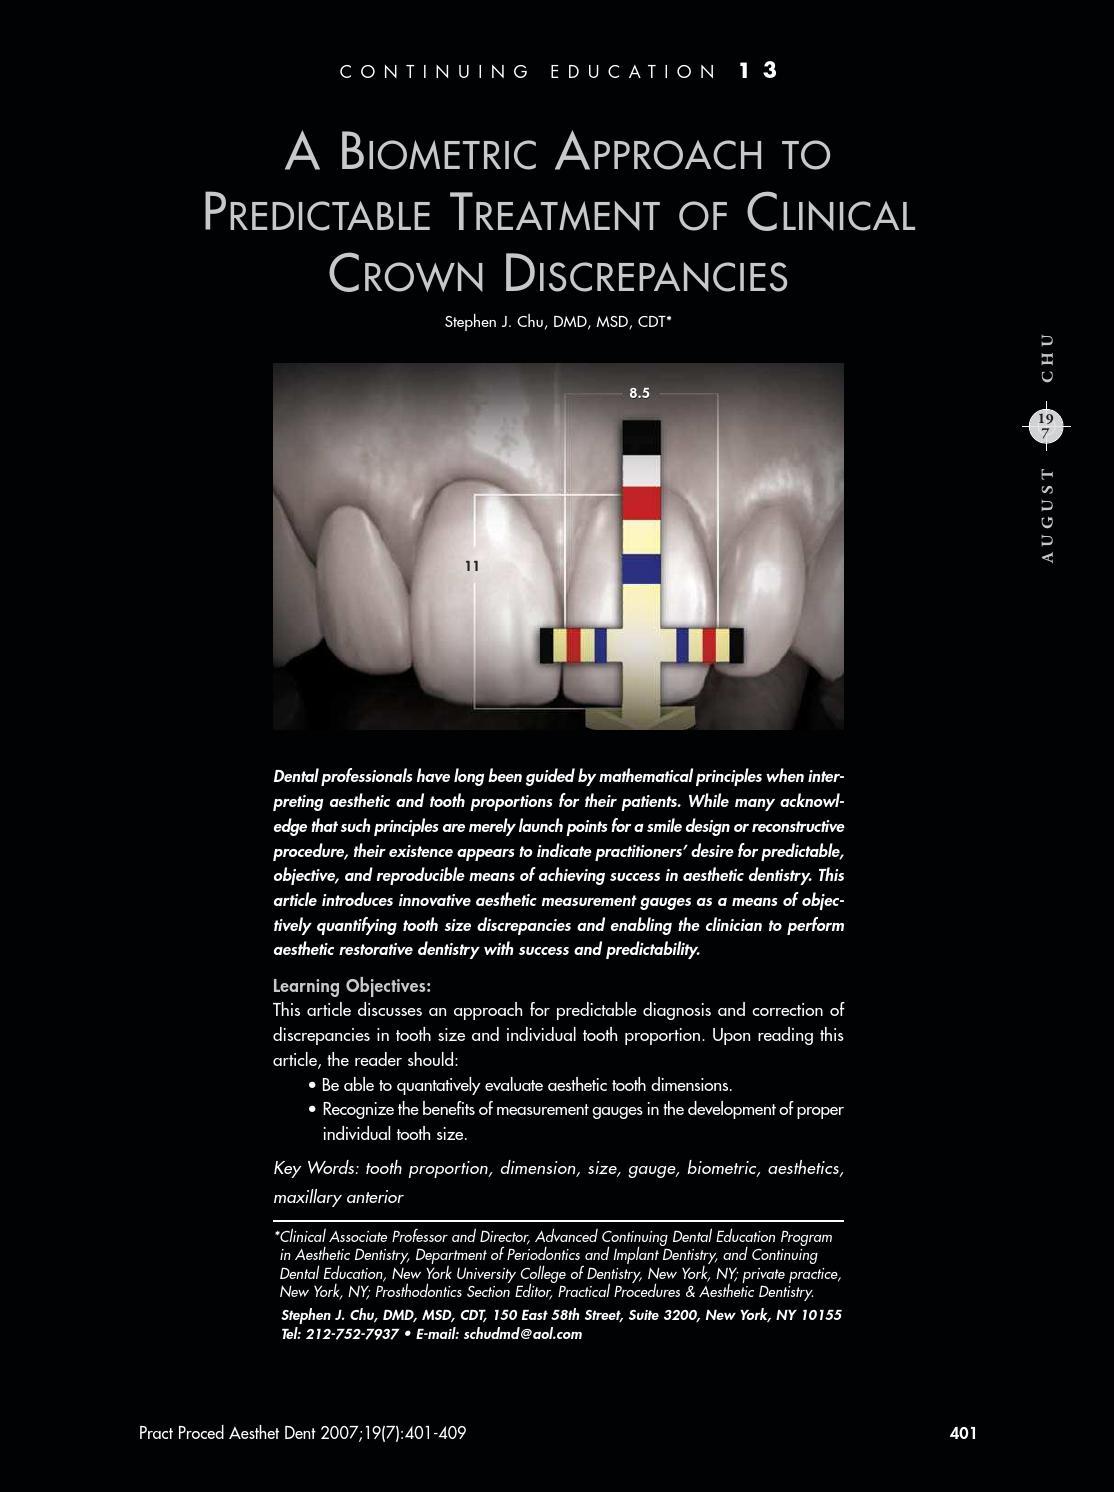 Chu biometric approach crown discrepancies by Hu-Friedy - issuu